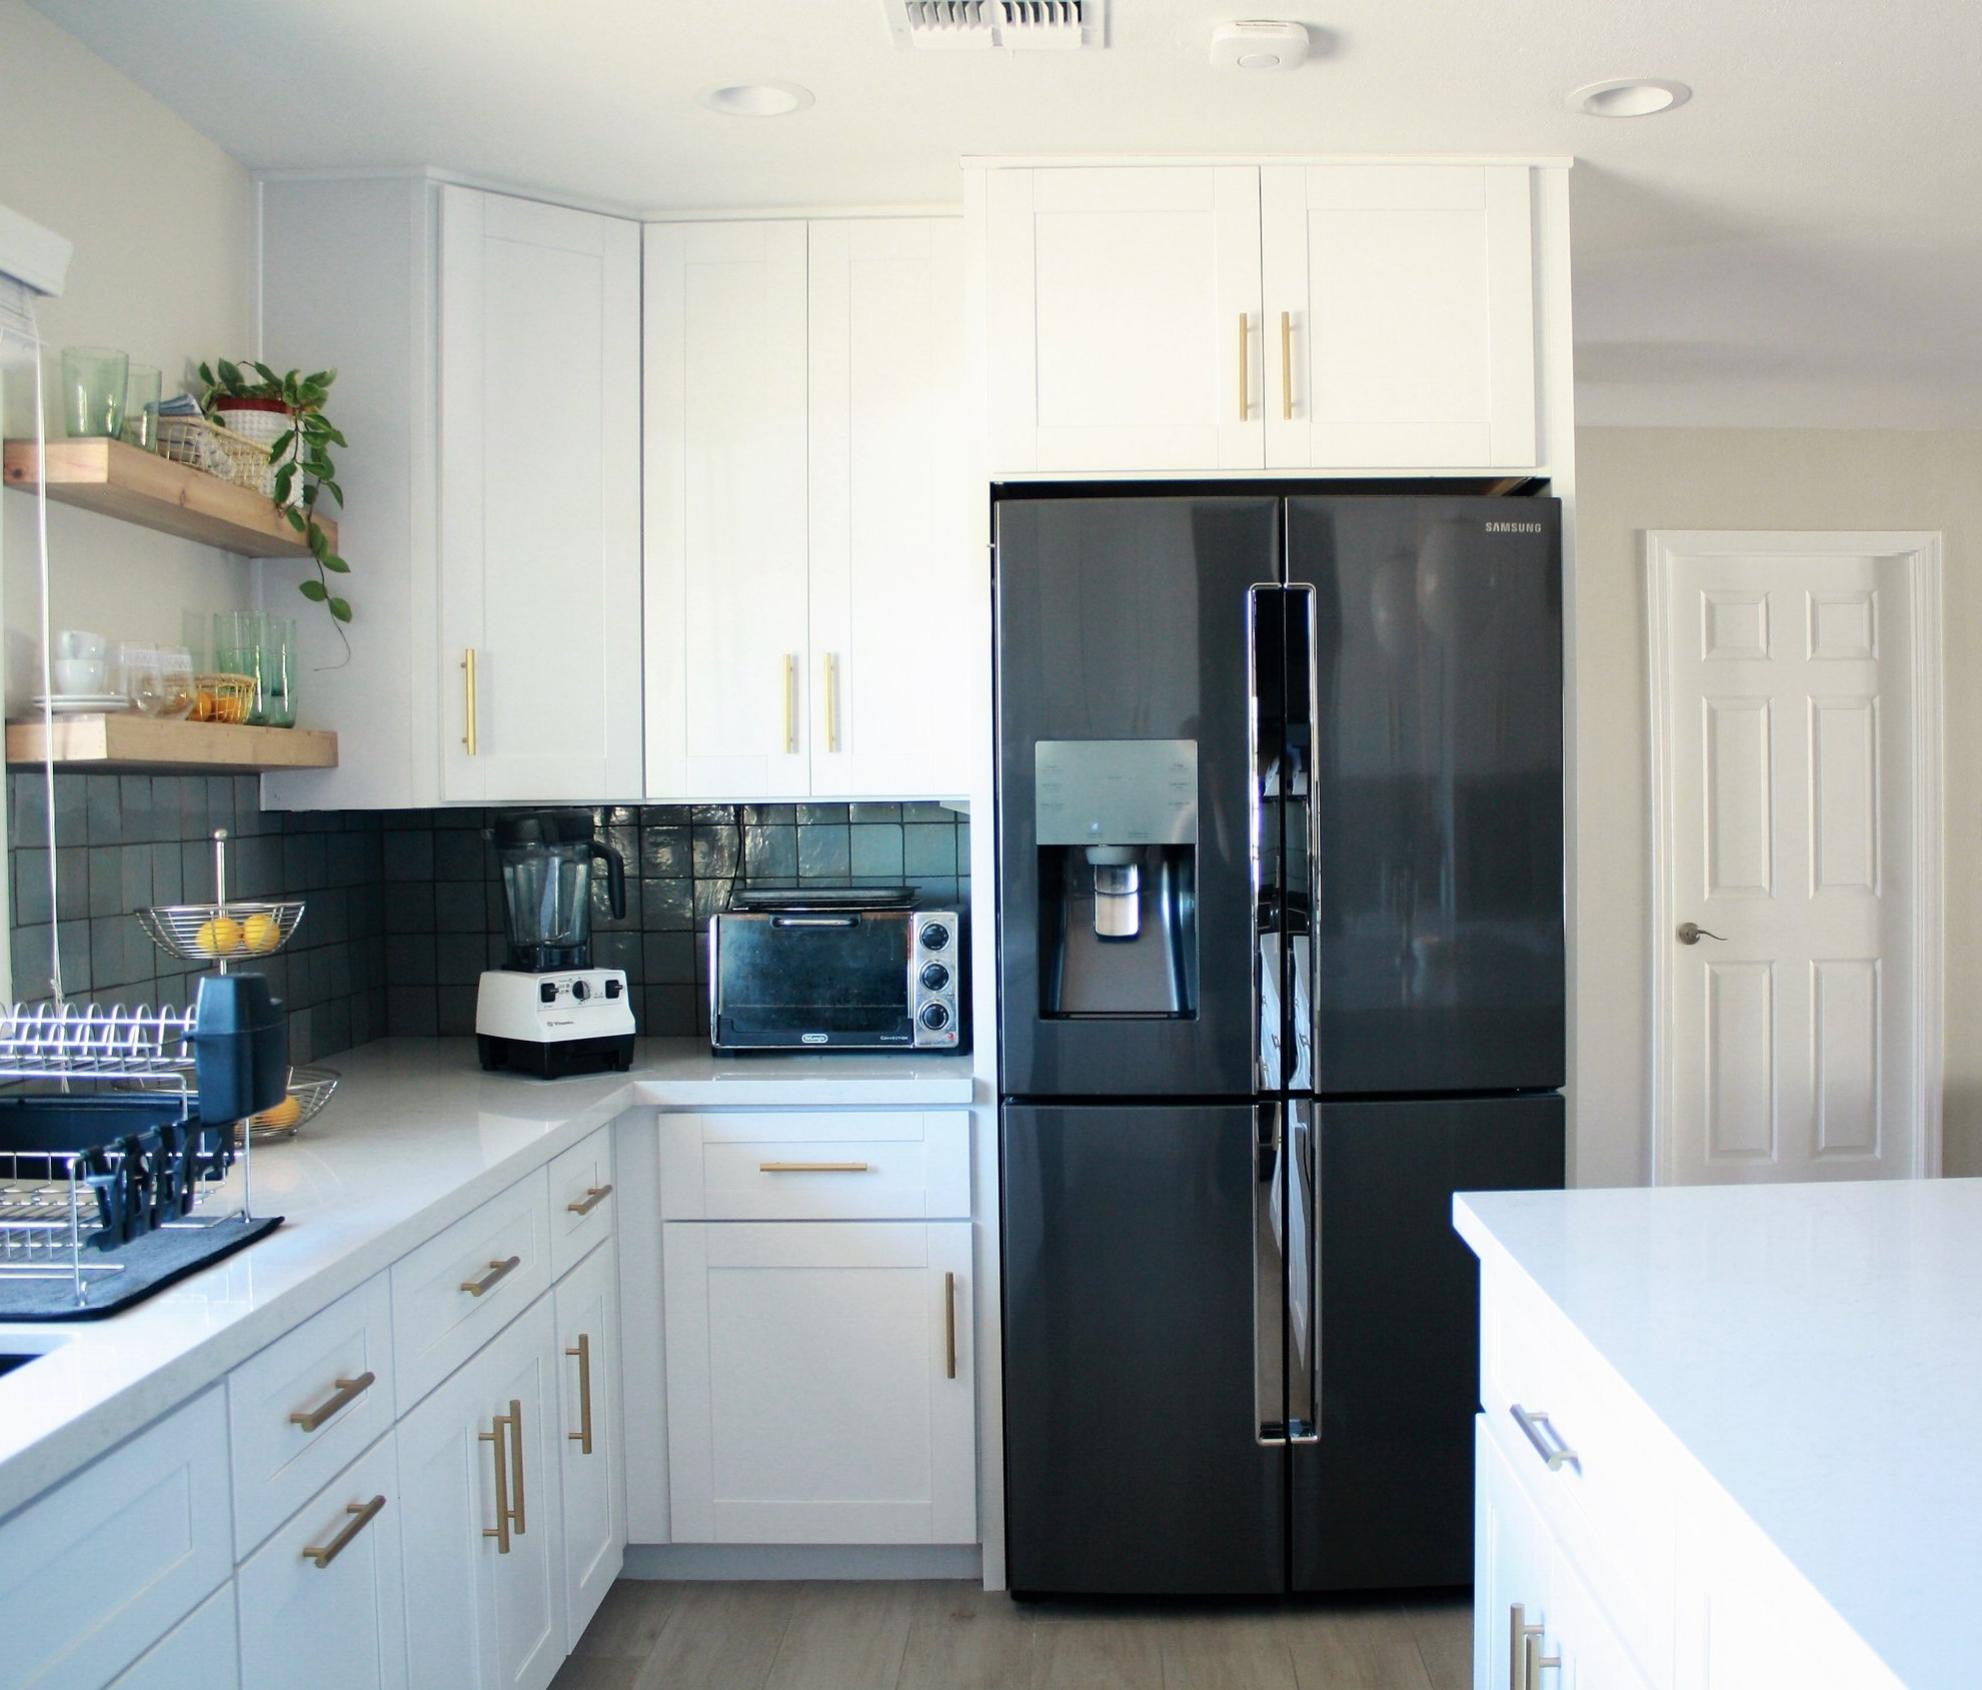 Wong kitchen 4.JPG